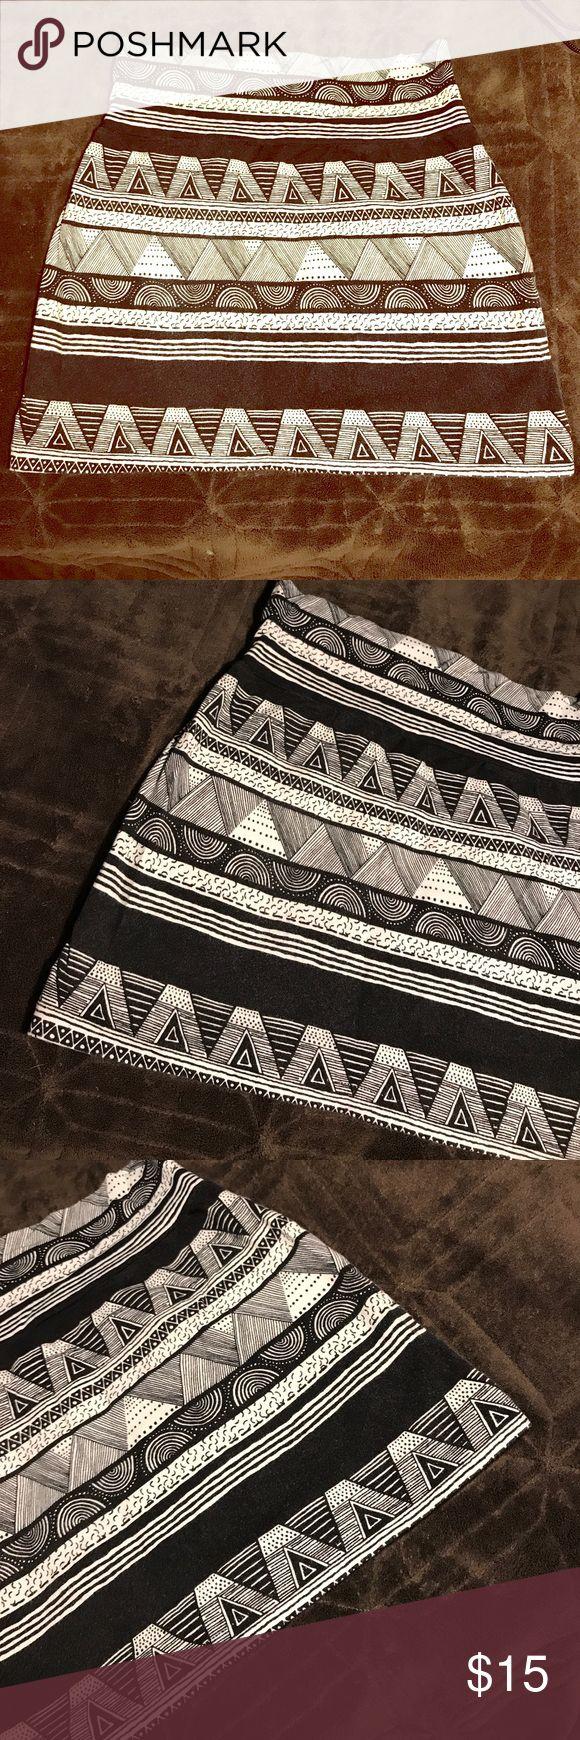 American apparel tribal print skirt American apparel tribal print skirt. Size small. Never worn just tried on. Did not fit. American Apparel Skirts Mini